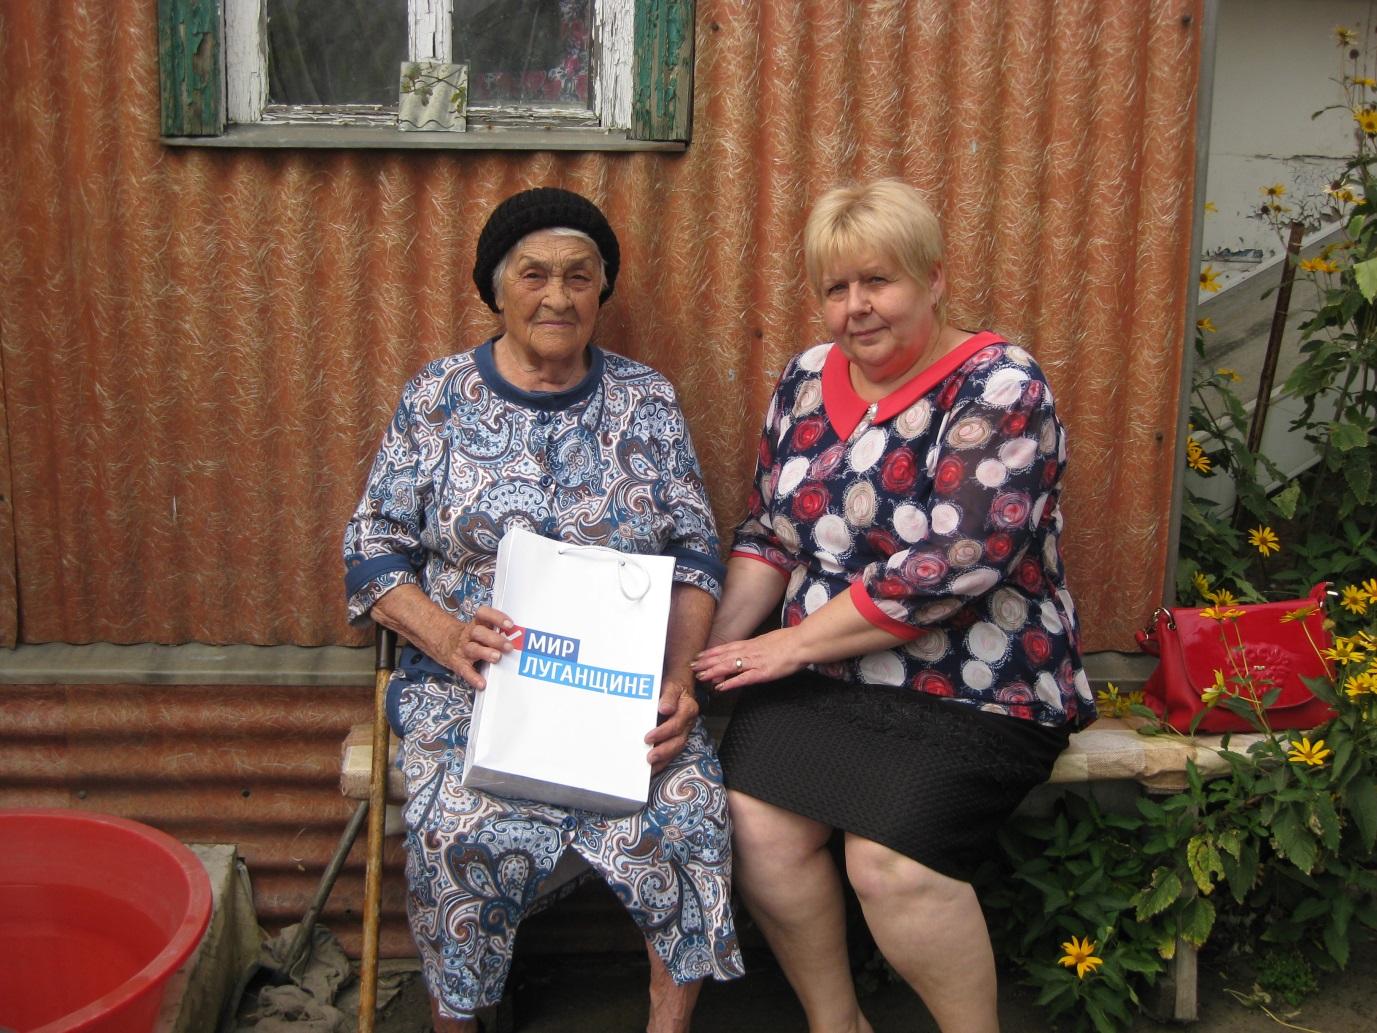 Координатор проекта «Забота о ветеранах» в Антраците поздравила ветерана с 96-летием 1